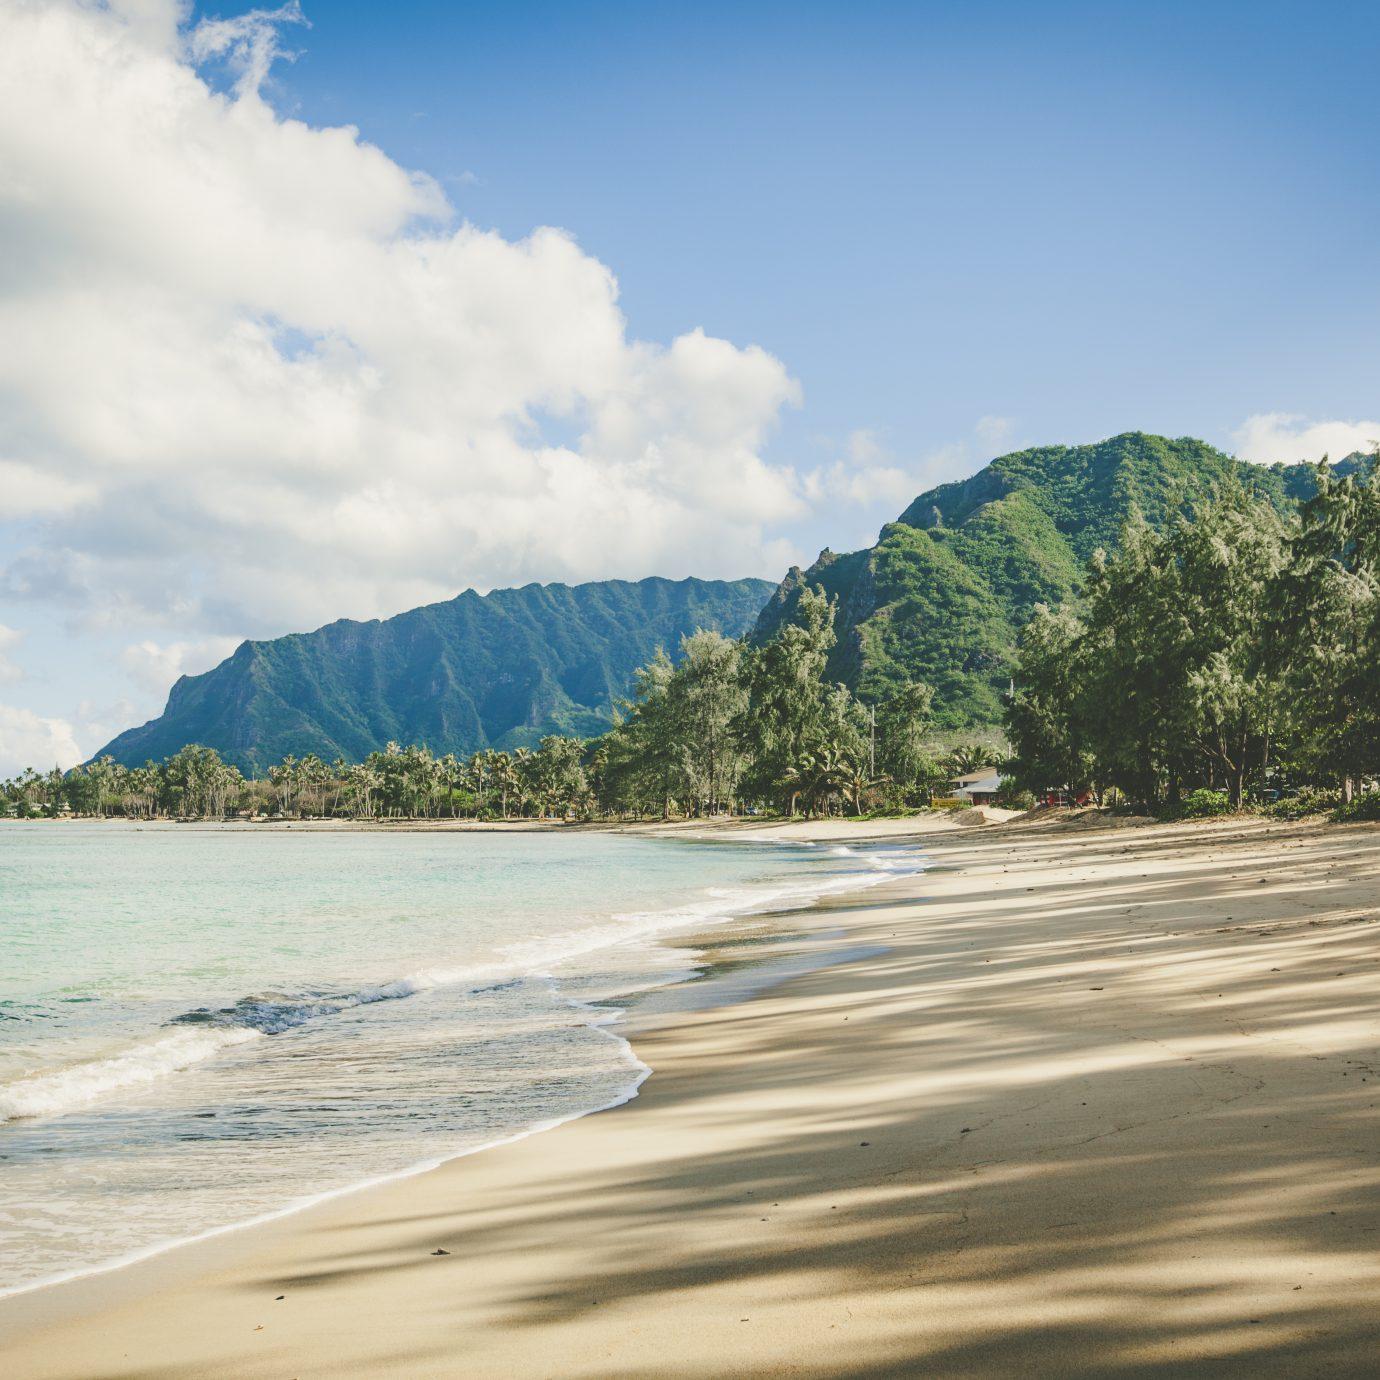 beach on oahu island, hawaii islands.